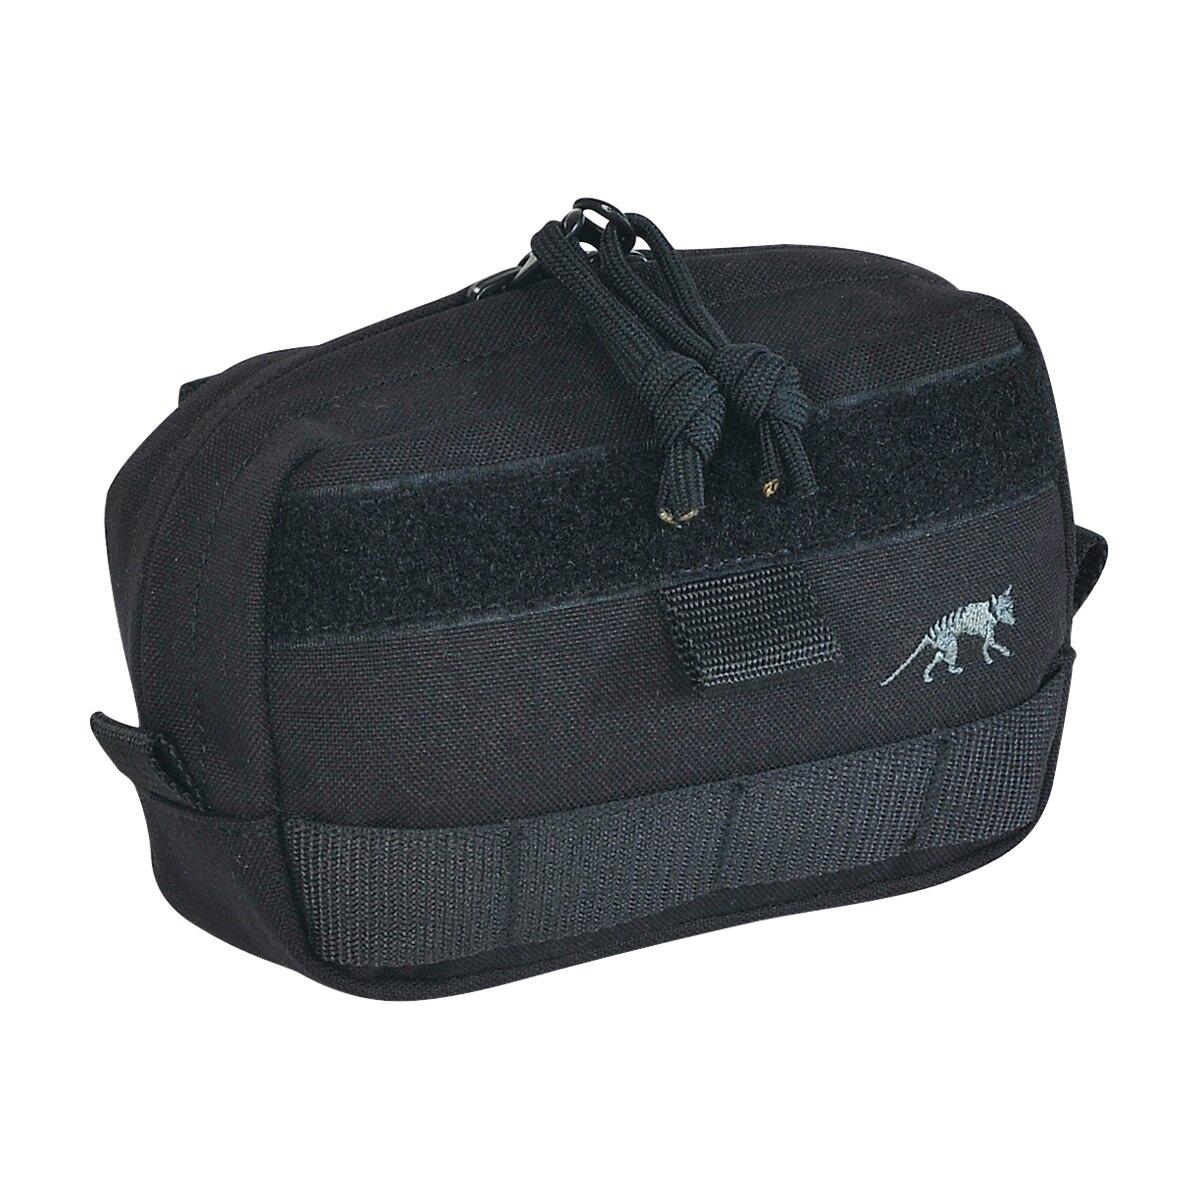 Puzdro Tasmanian Tiger® 4 Horizontal - čierne (Farba: Čierna)